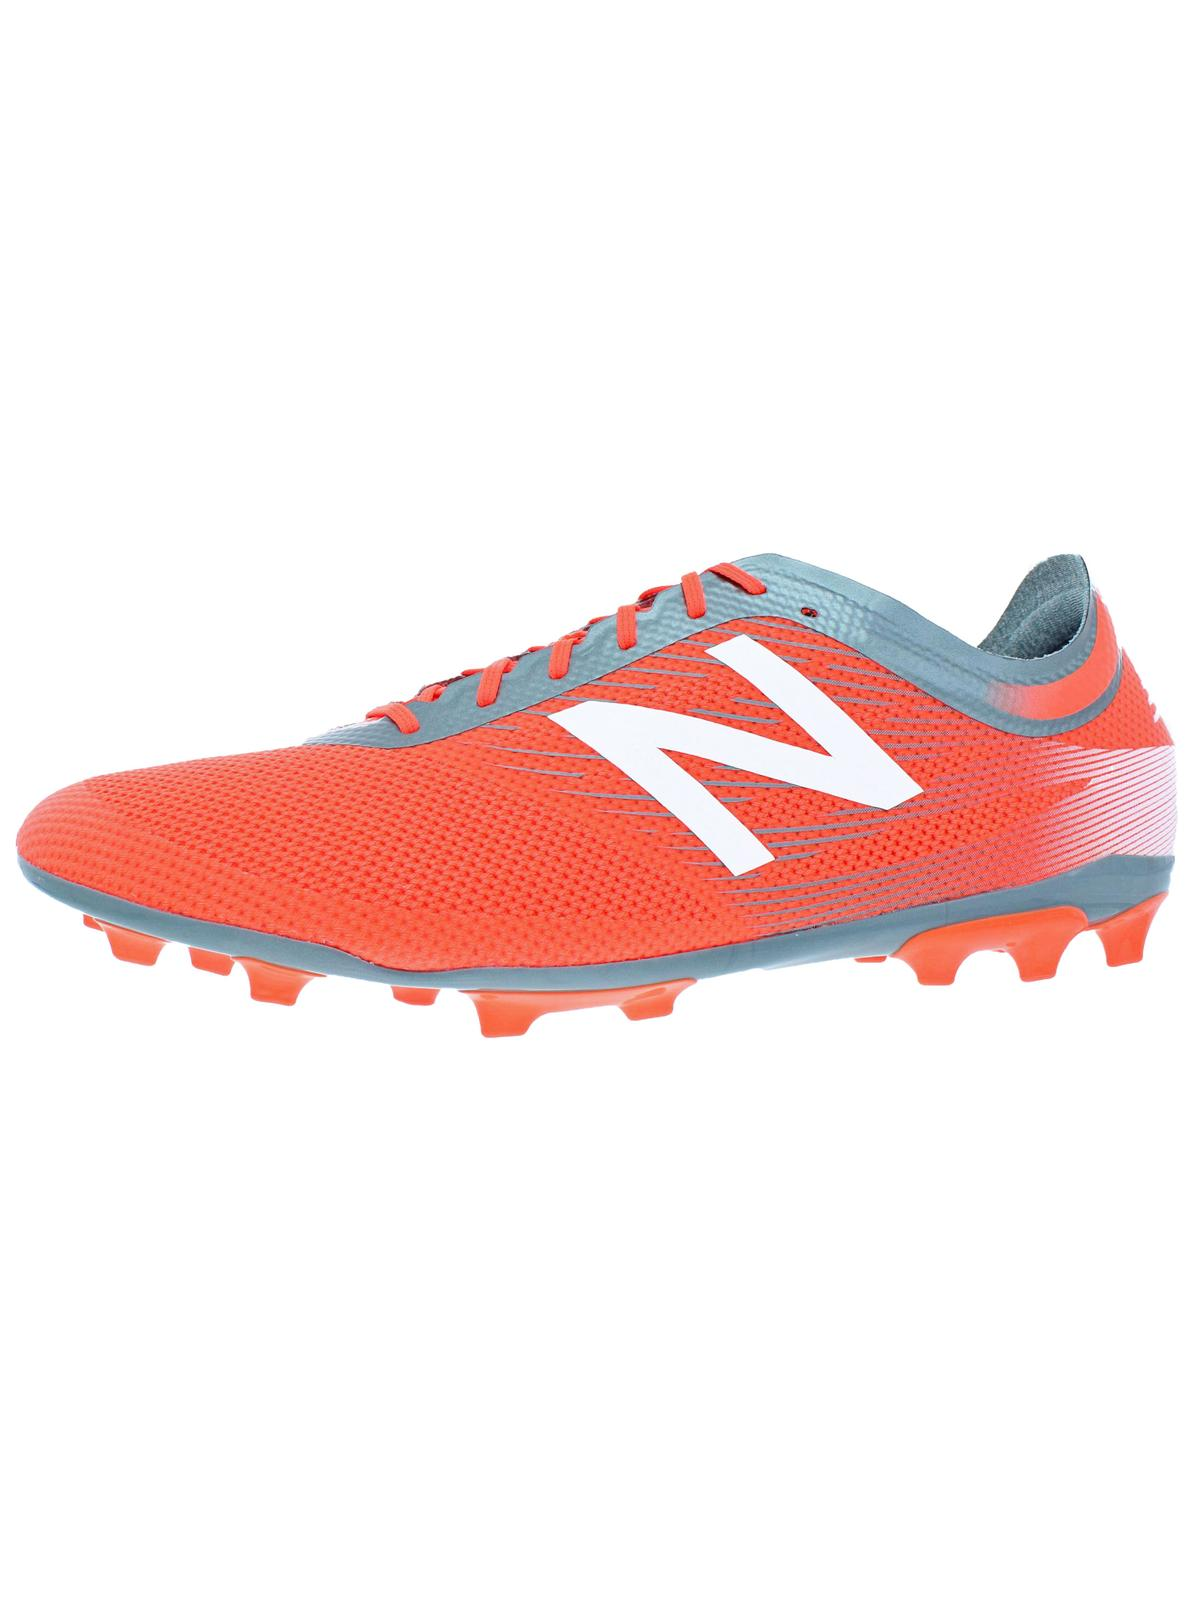 New Balance Mens Furon 2.0 Dispatch FG Soccer REVlite Cleats